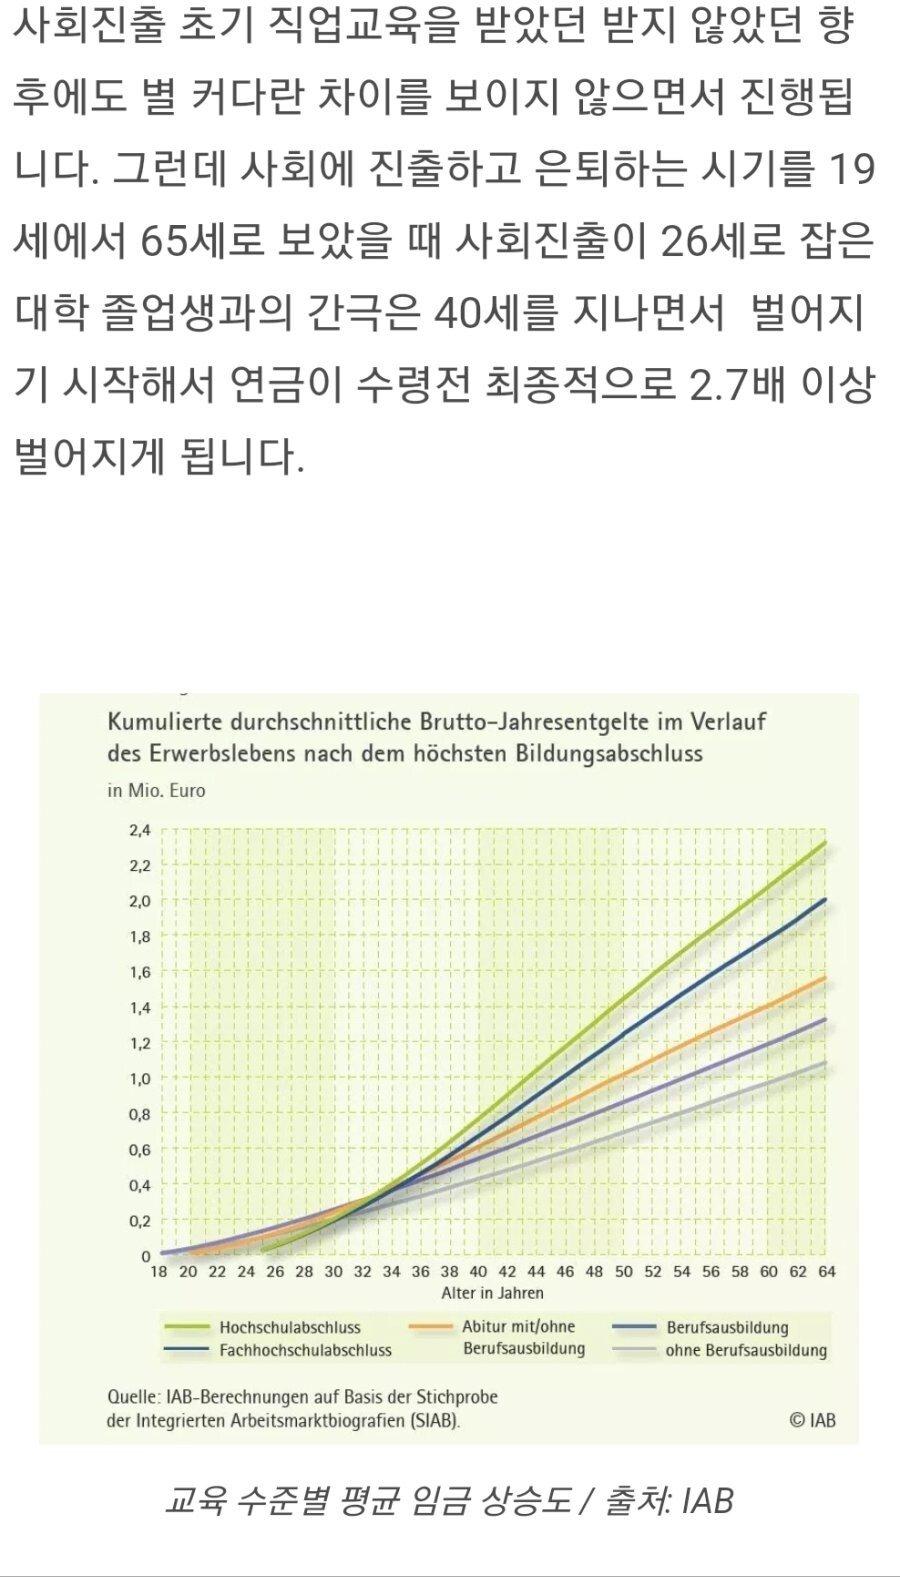 16869a3e66e4b5f7a.jpg 한국에서 본 받자는 독일 교육제도의 실상